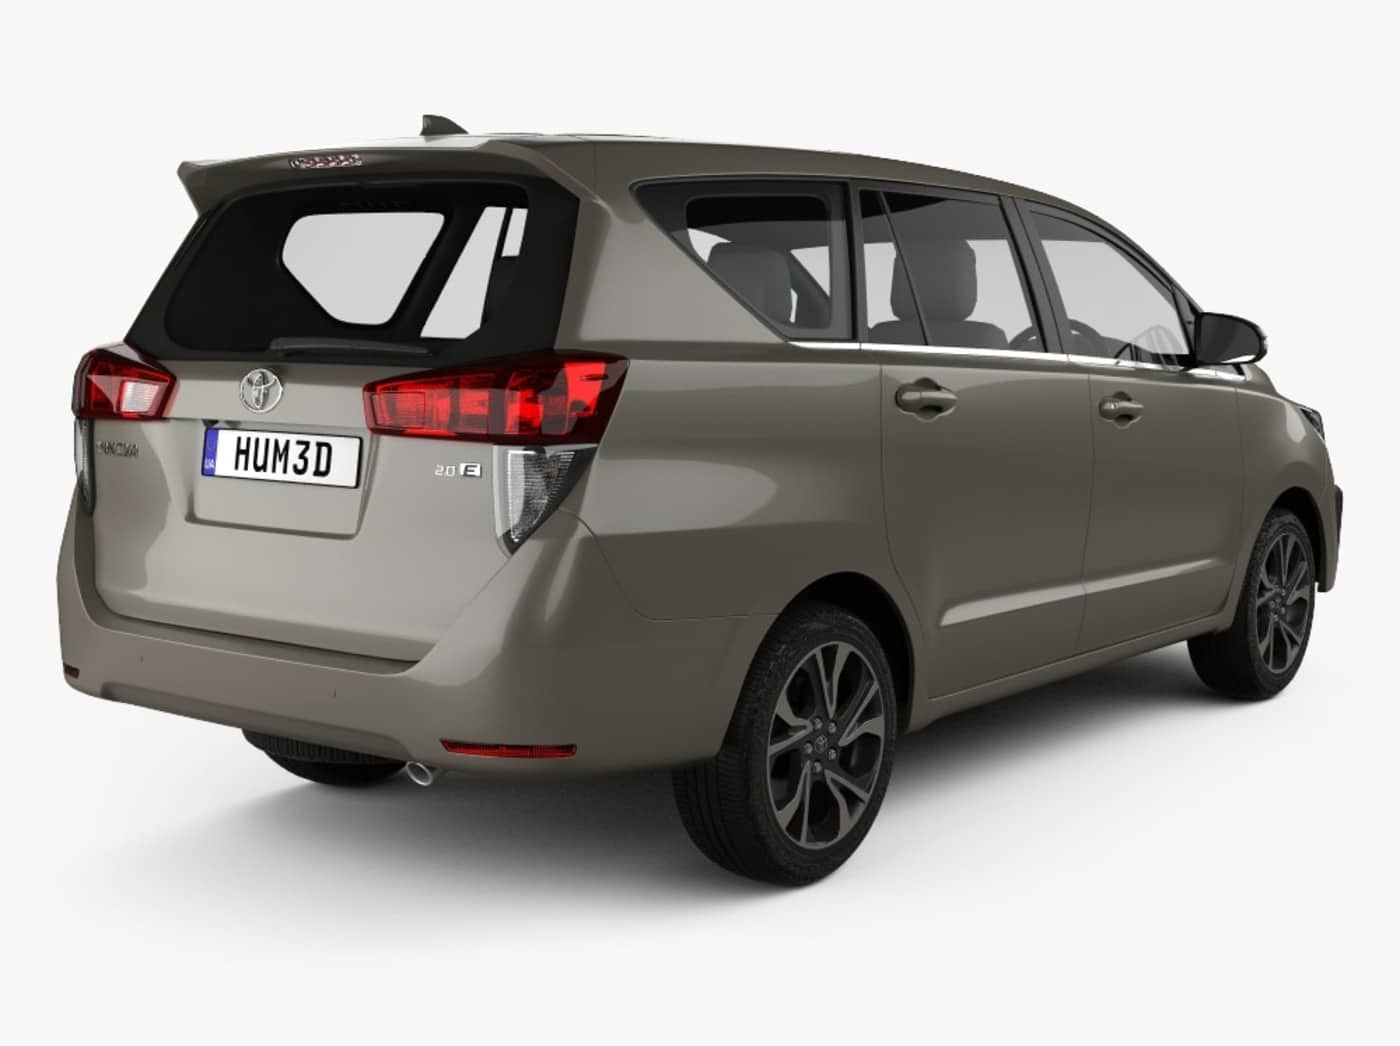 duoi xe toyota innova facelift front 2021 muaxegiatot vn Đánh giá xe Toyota Innova 2021 kèm giá bán #1